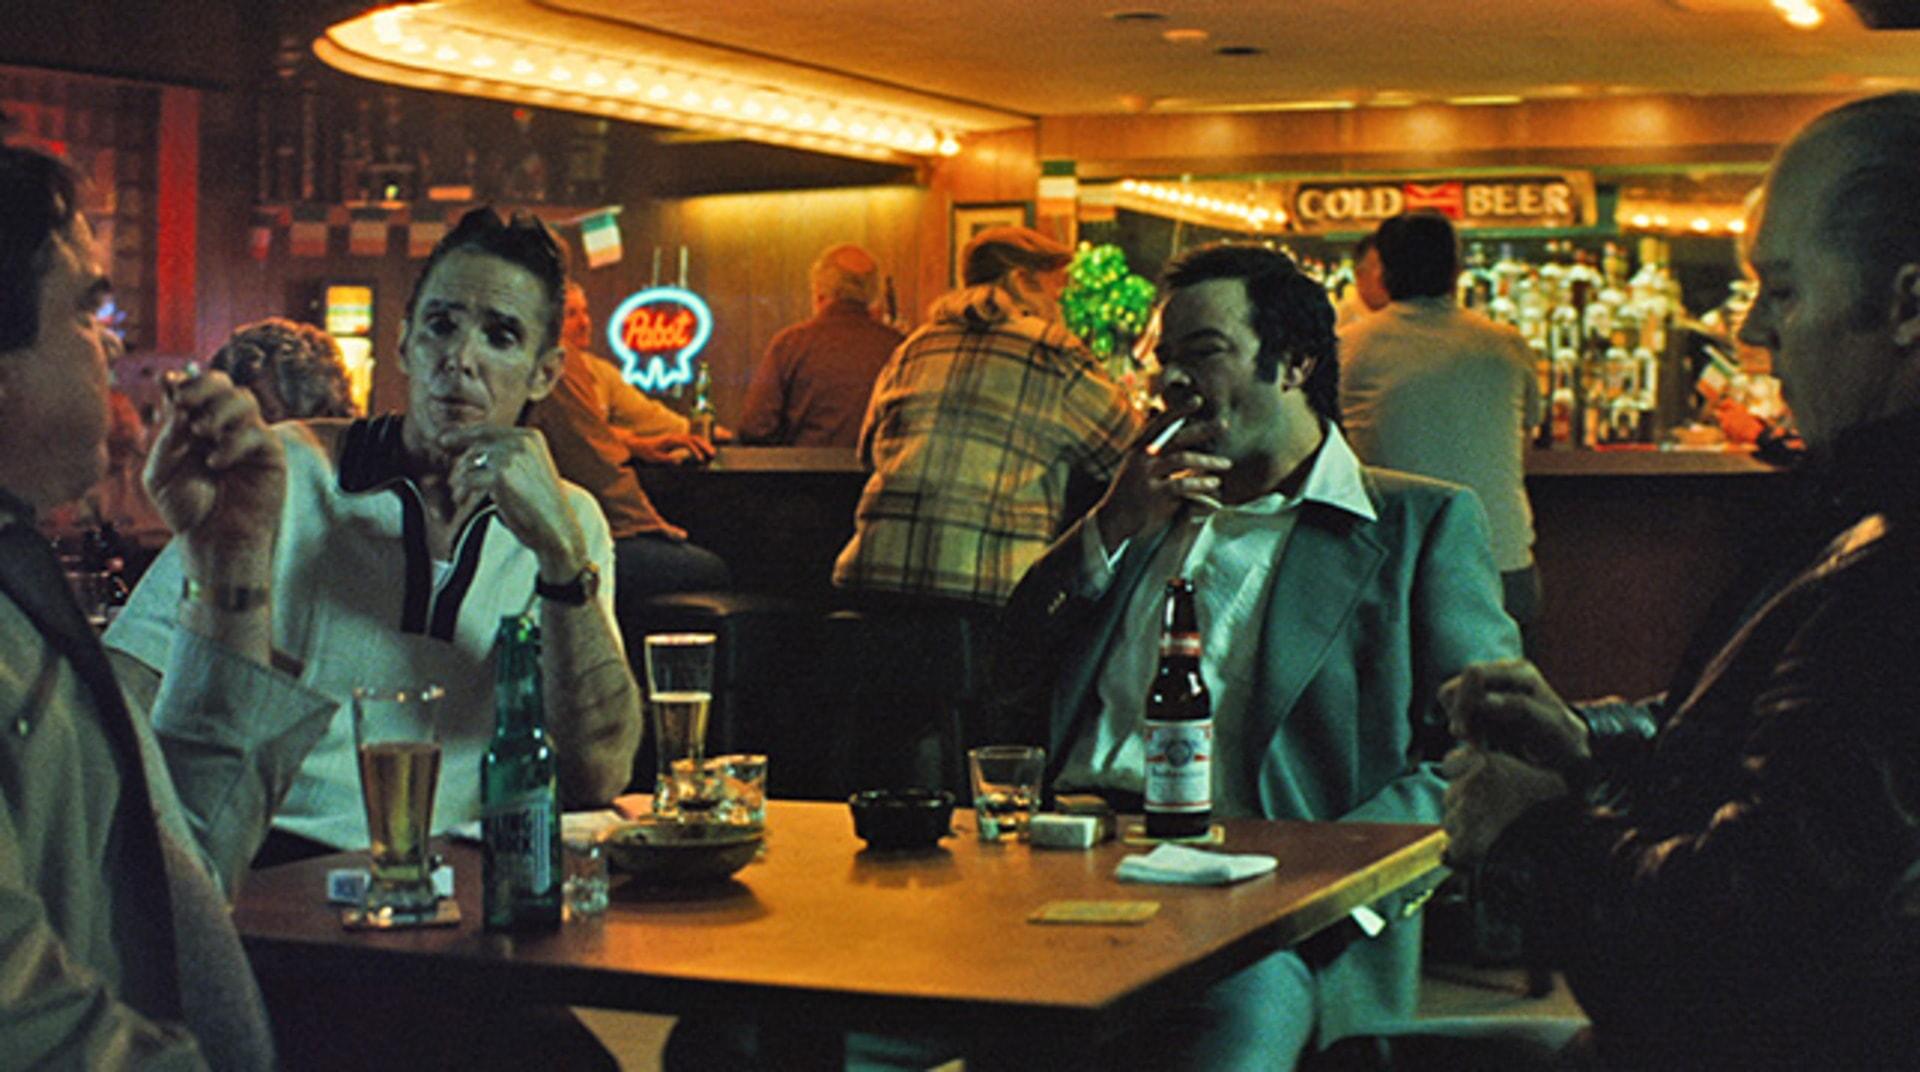 "W EARL BROWN as John Martorano, MARK MAHONEY as Mickey Maloney, RORY COCHRANE as Stephen Flemmi and JOHNNY DEPP as Whitey Bulger in the drama ""BLACK MASS."""